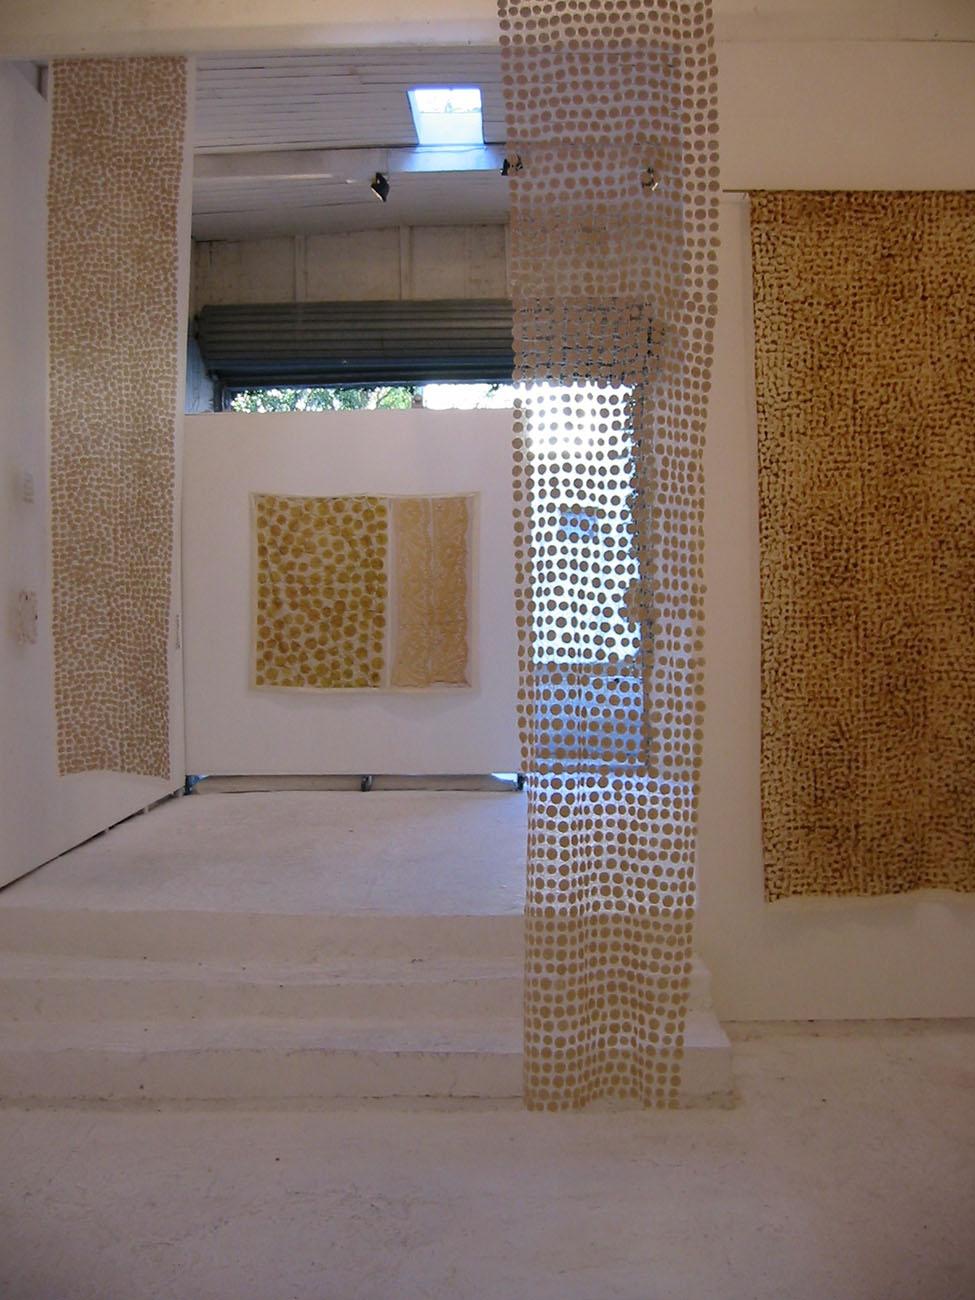 exhibition01.jpg